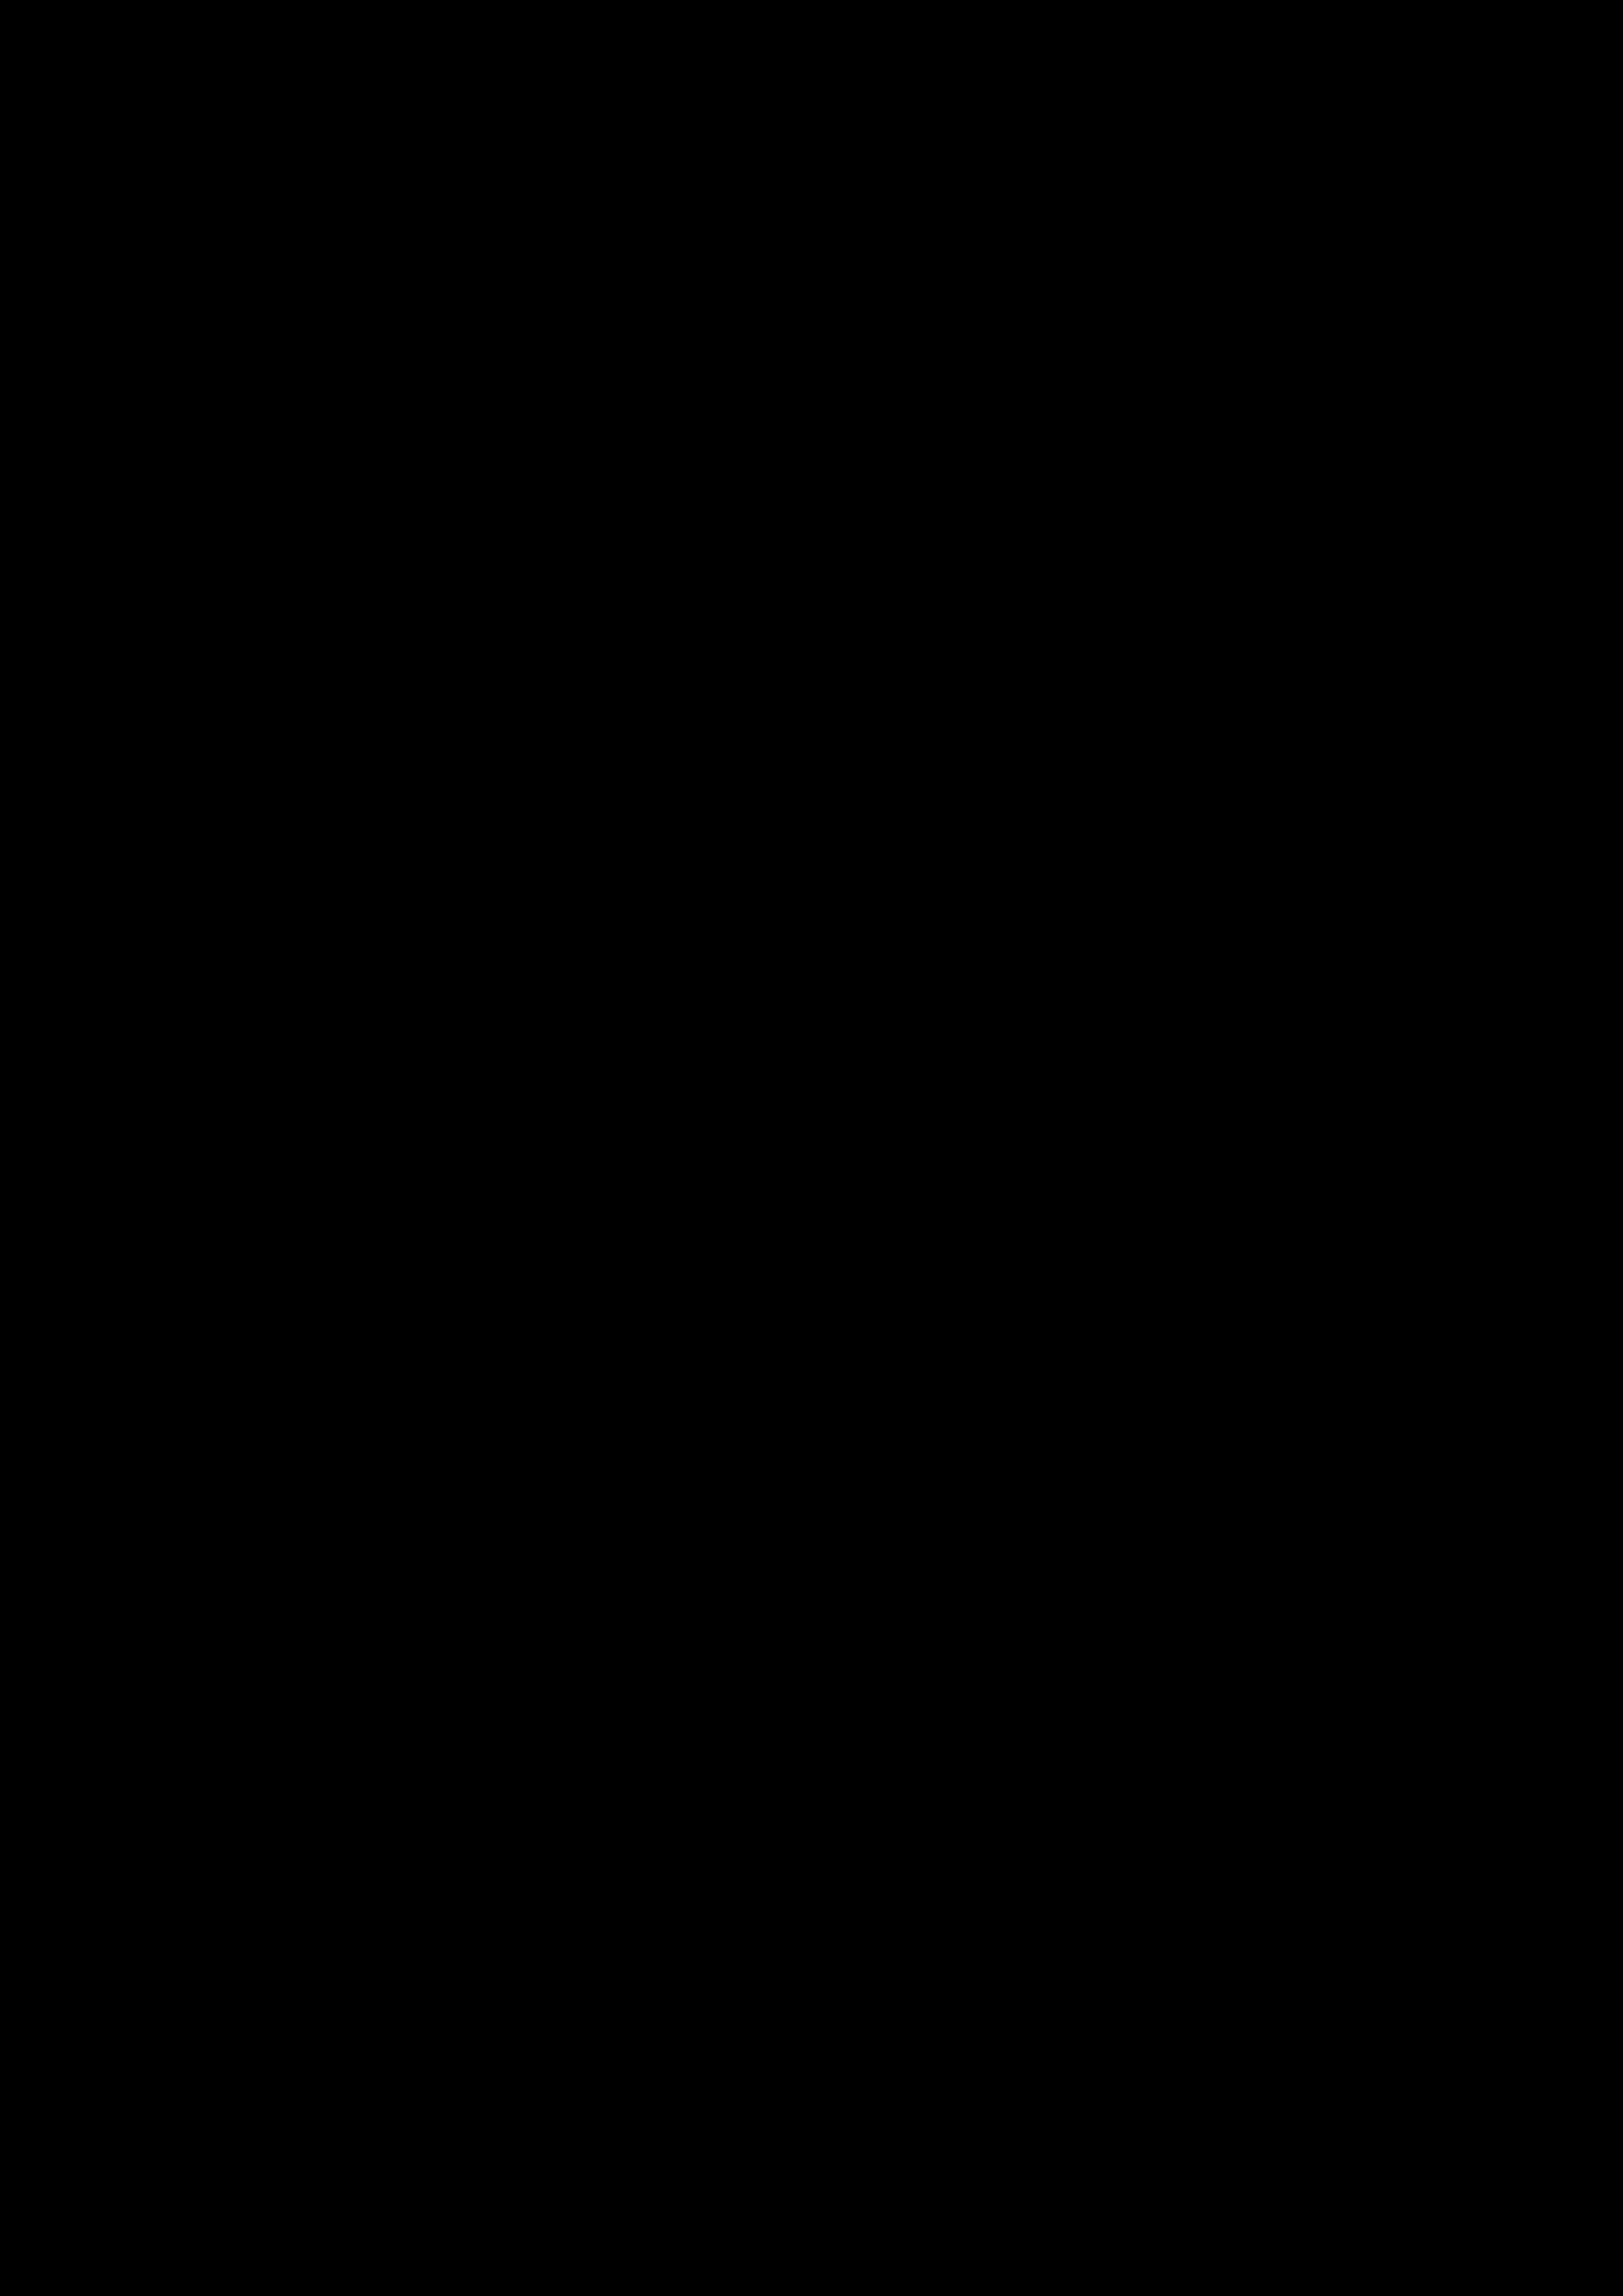 clip art royalty free download Lake clipart silhouette. Salt temple by sorenstoutner.